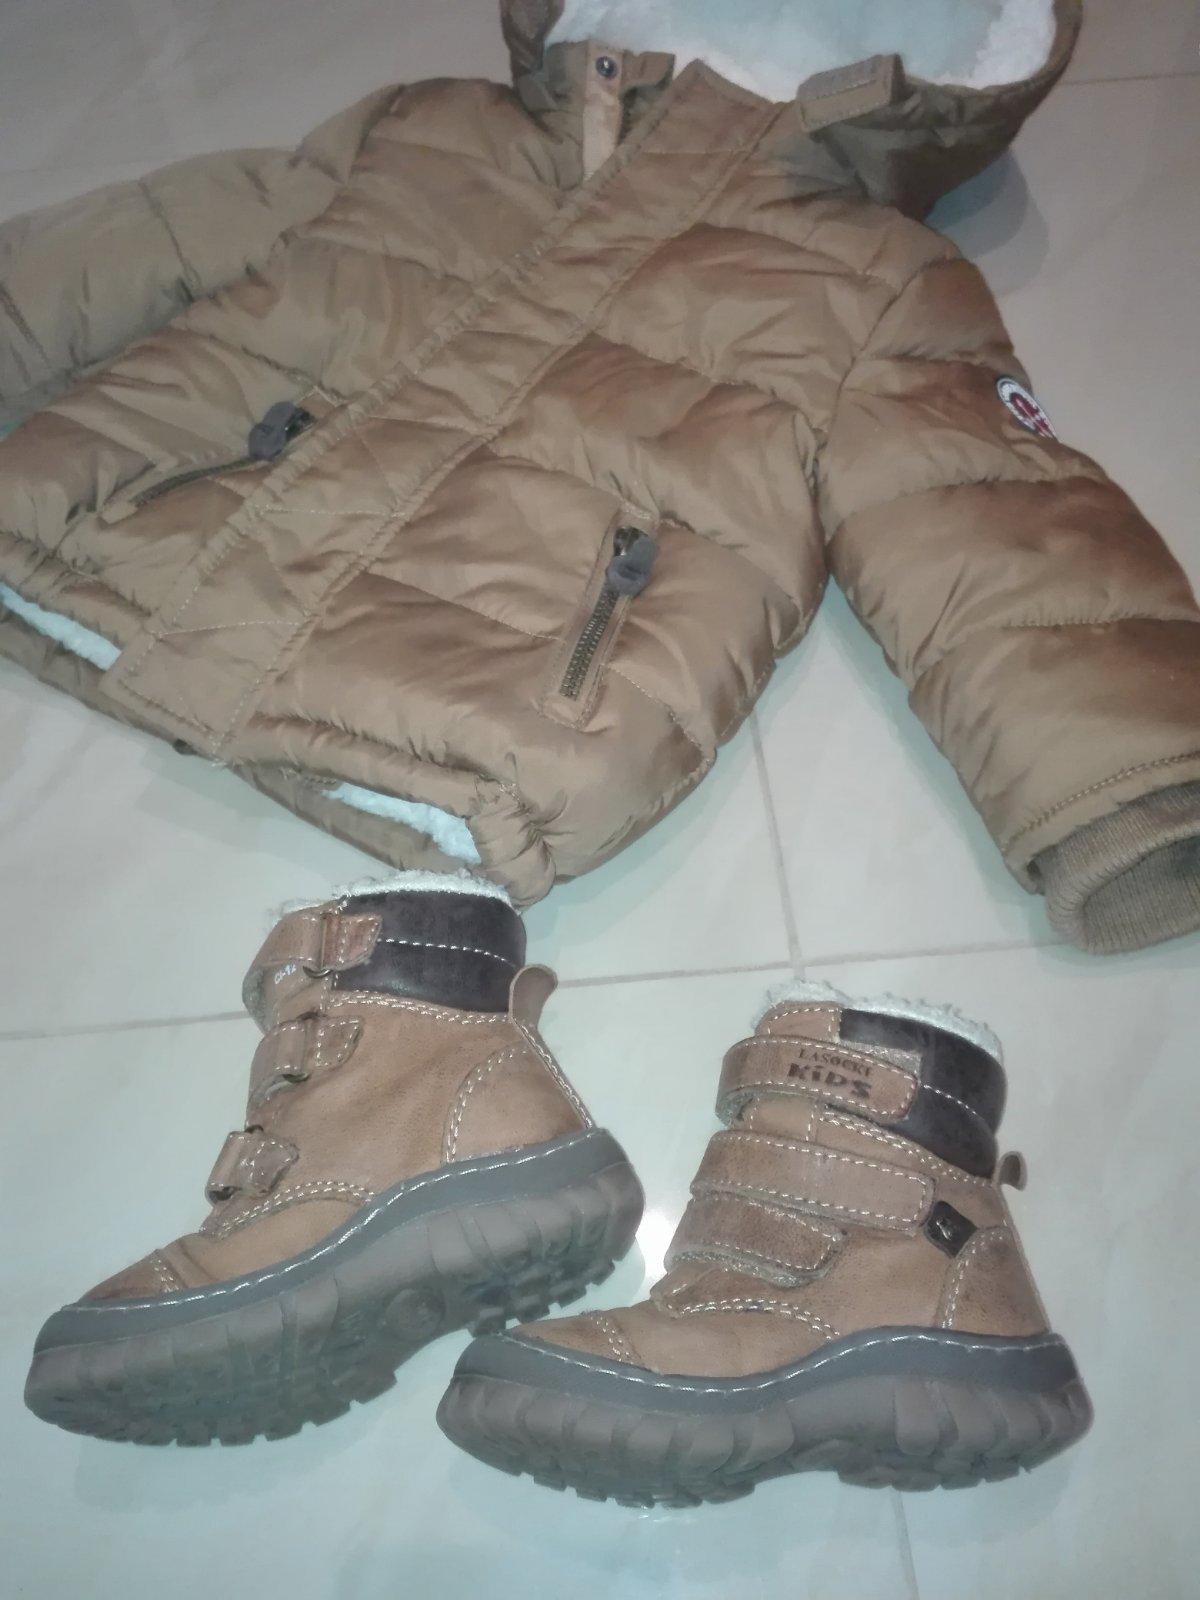 0f3f02d163 Kozene zimne topanky 12